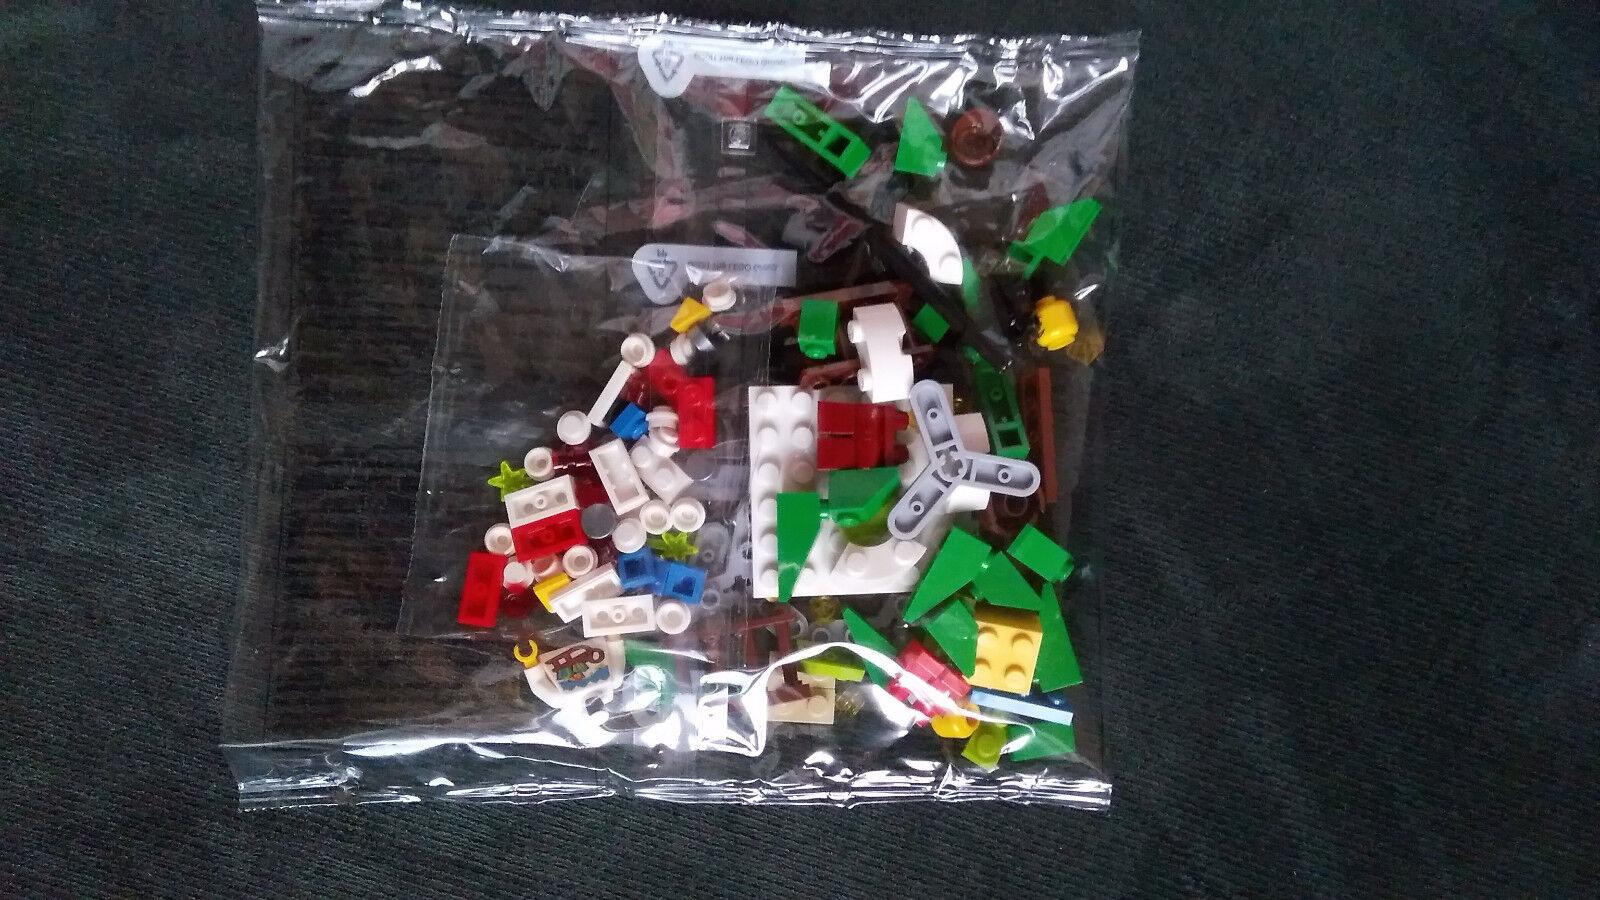 LEGO 4002017 Kladno factory Minifigure Christmas 2017, PF2018